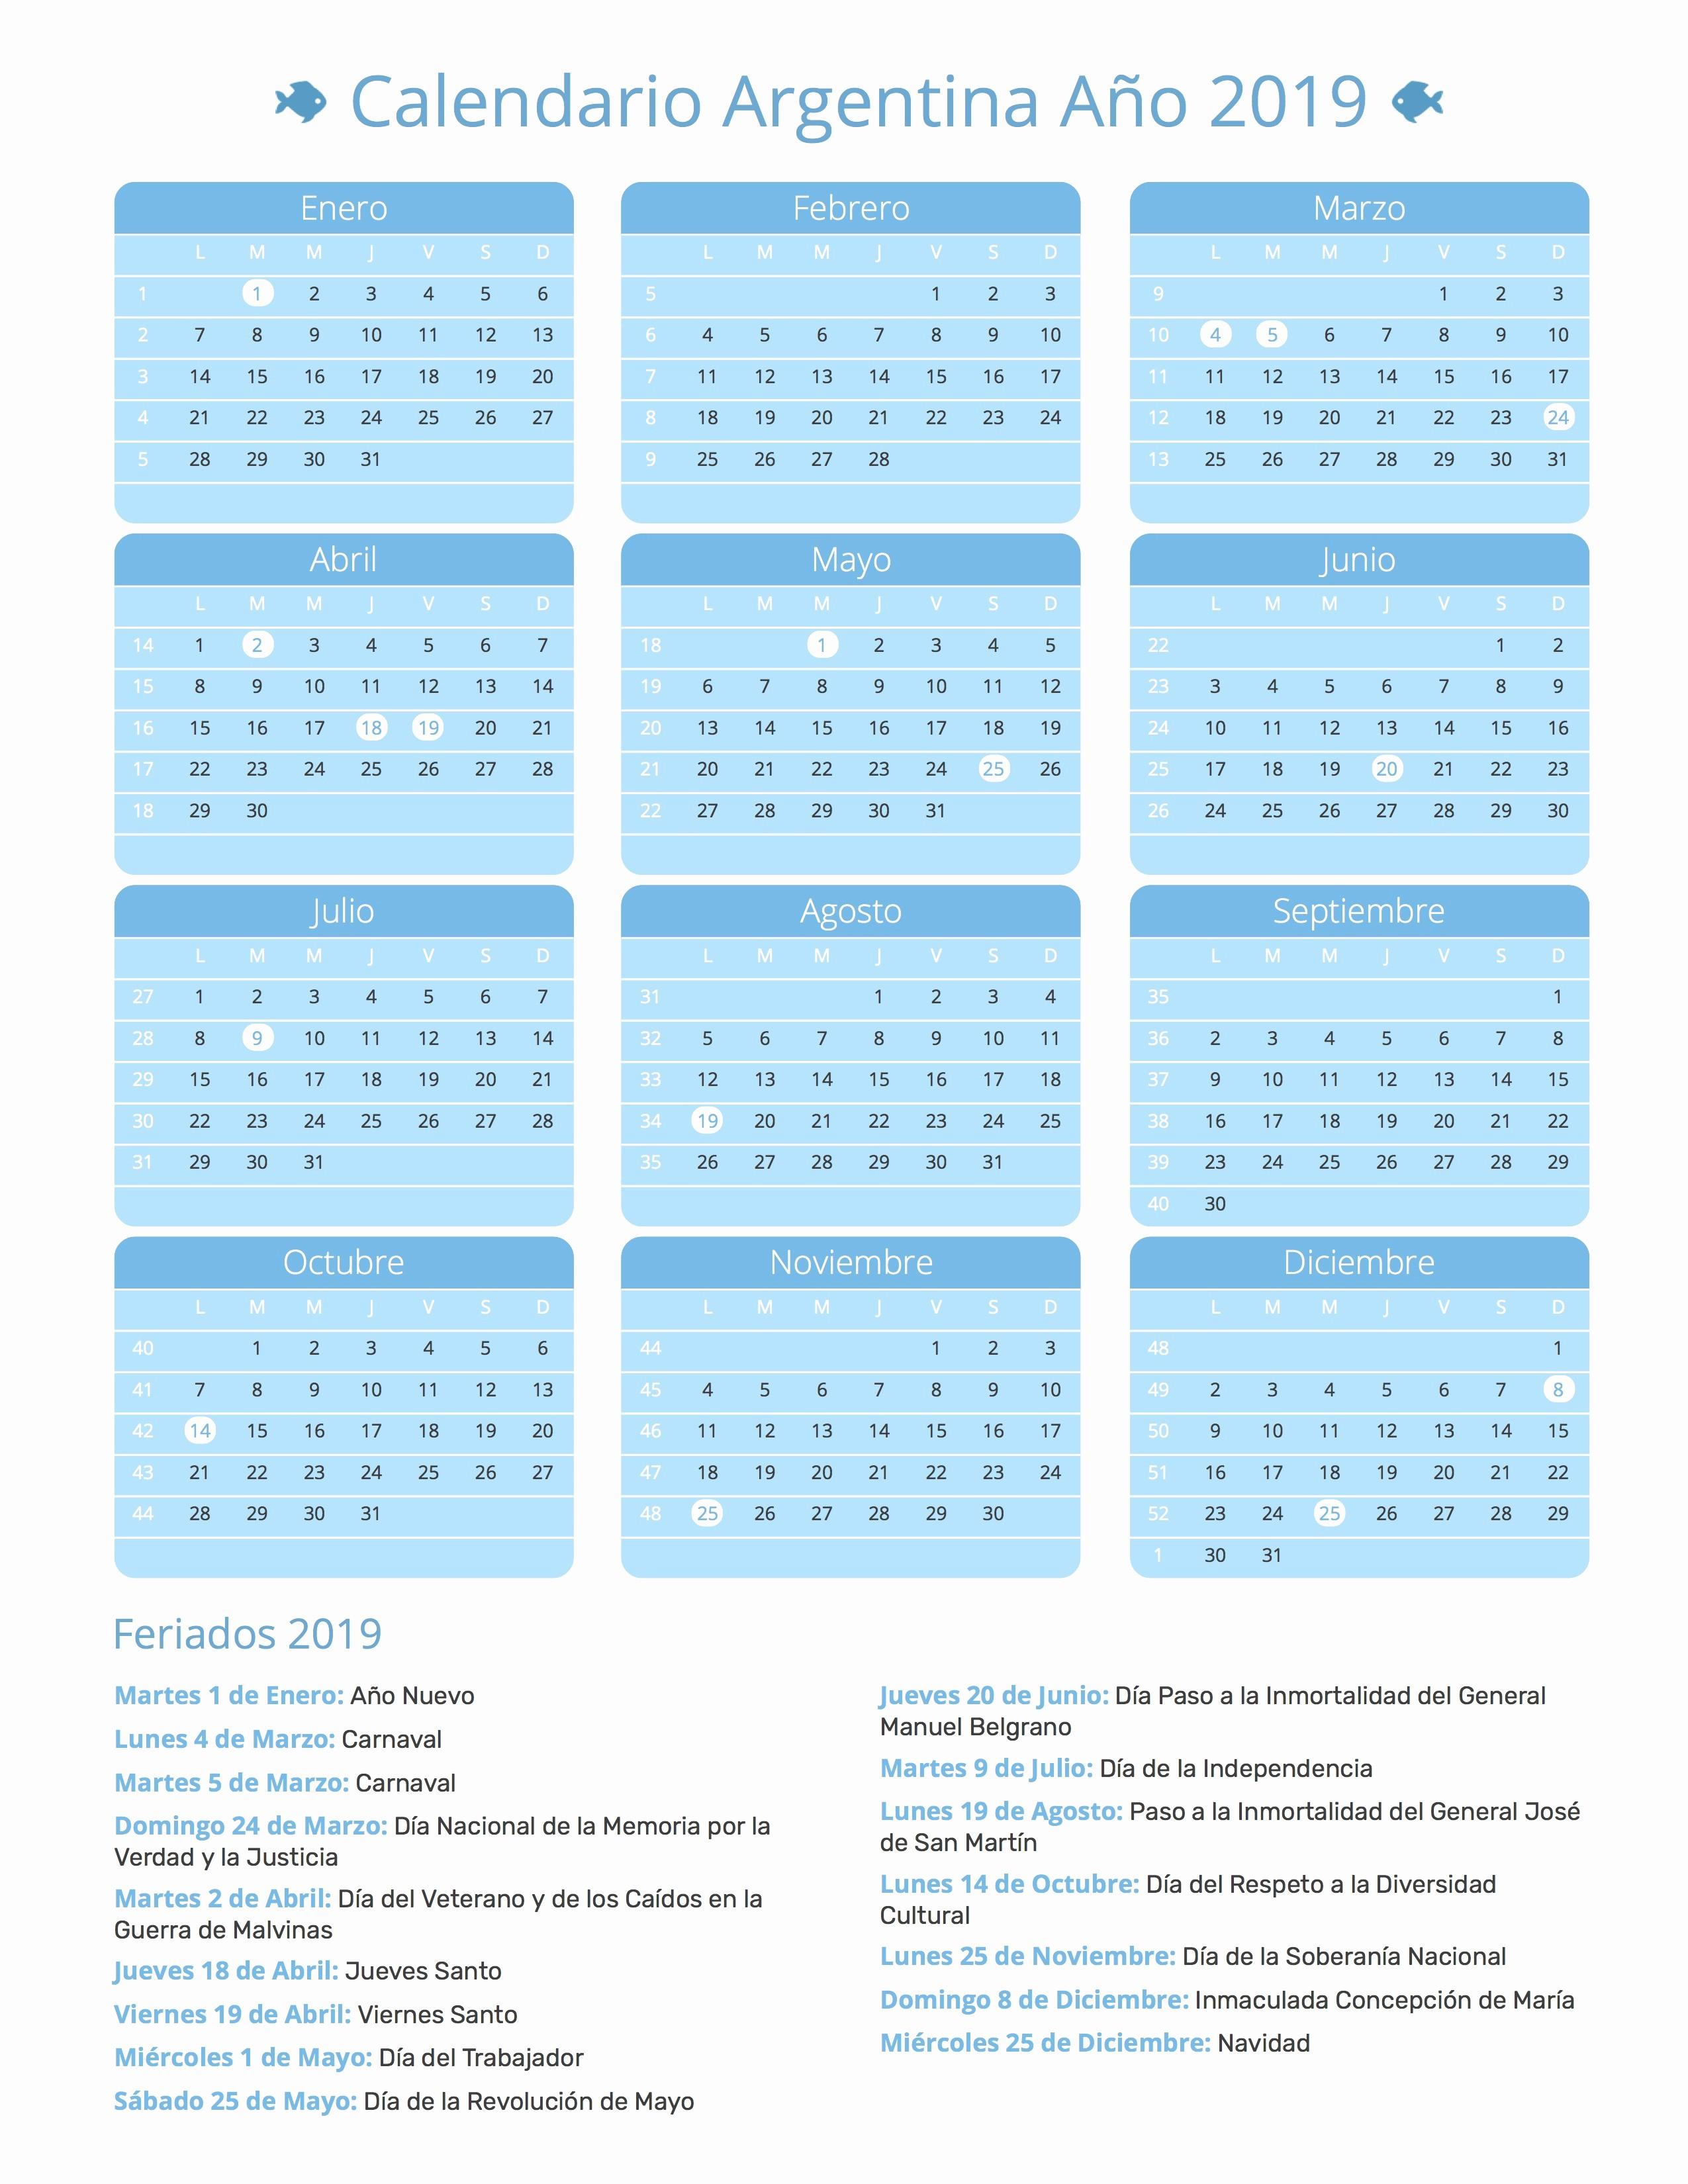 Cada Cuanto Se Repiten Los Calendarios 2019 Calendario Argentina Ano 2019 Feriados